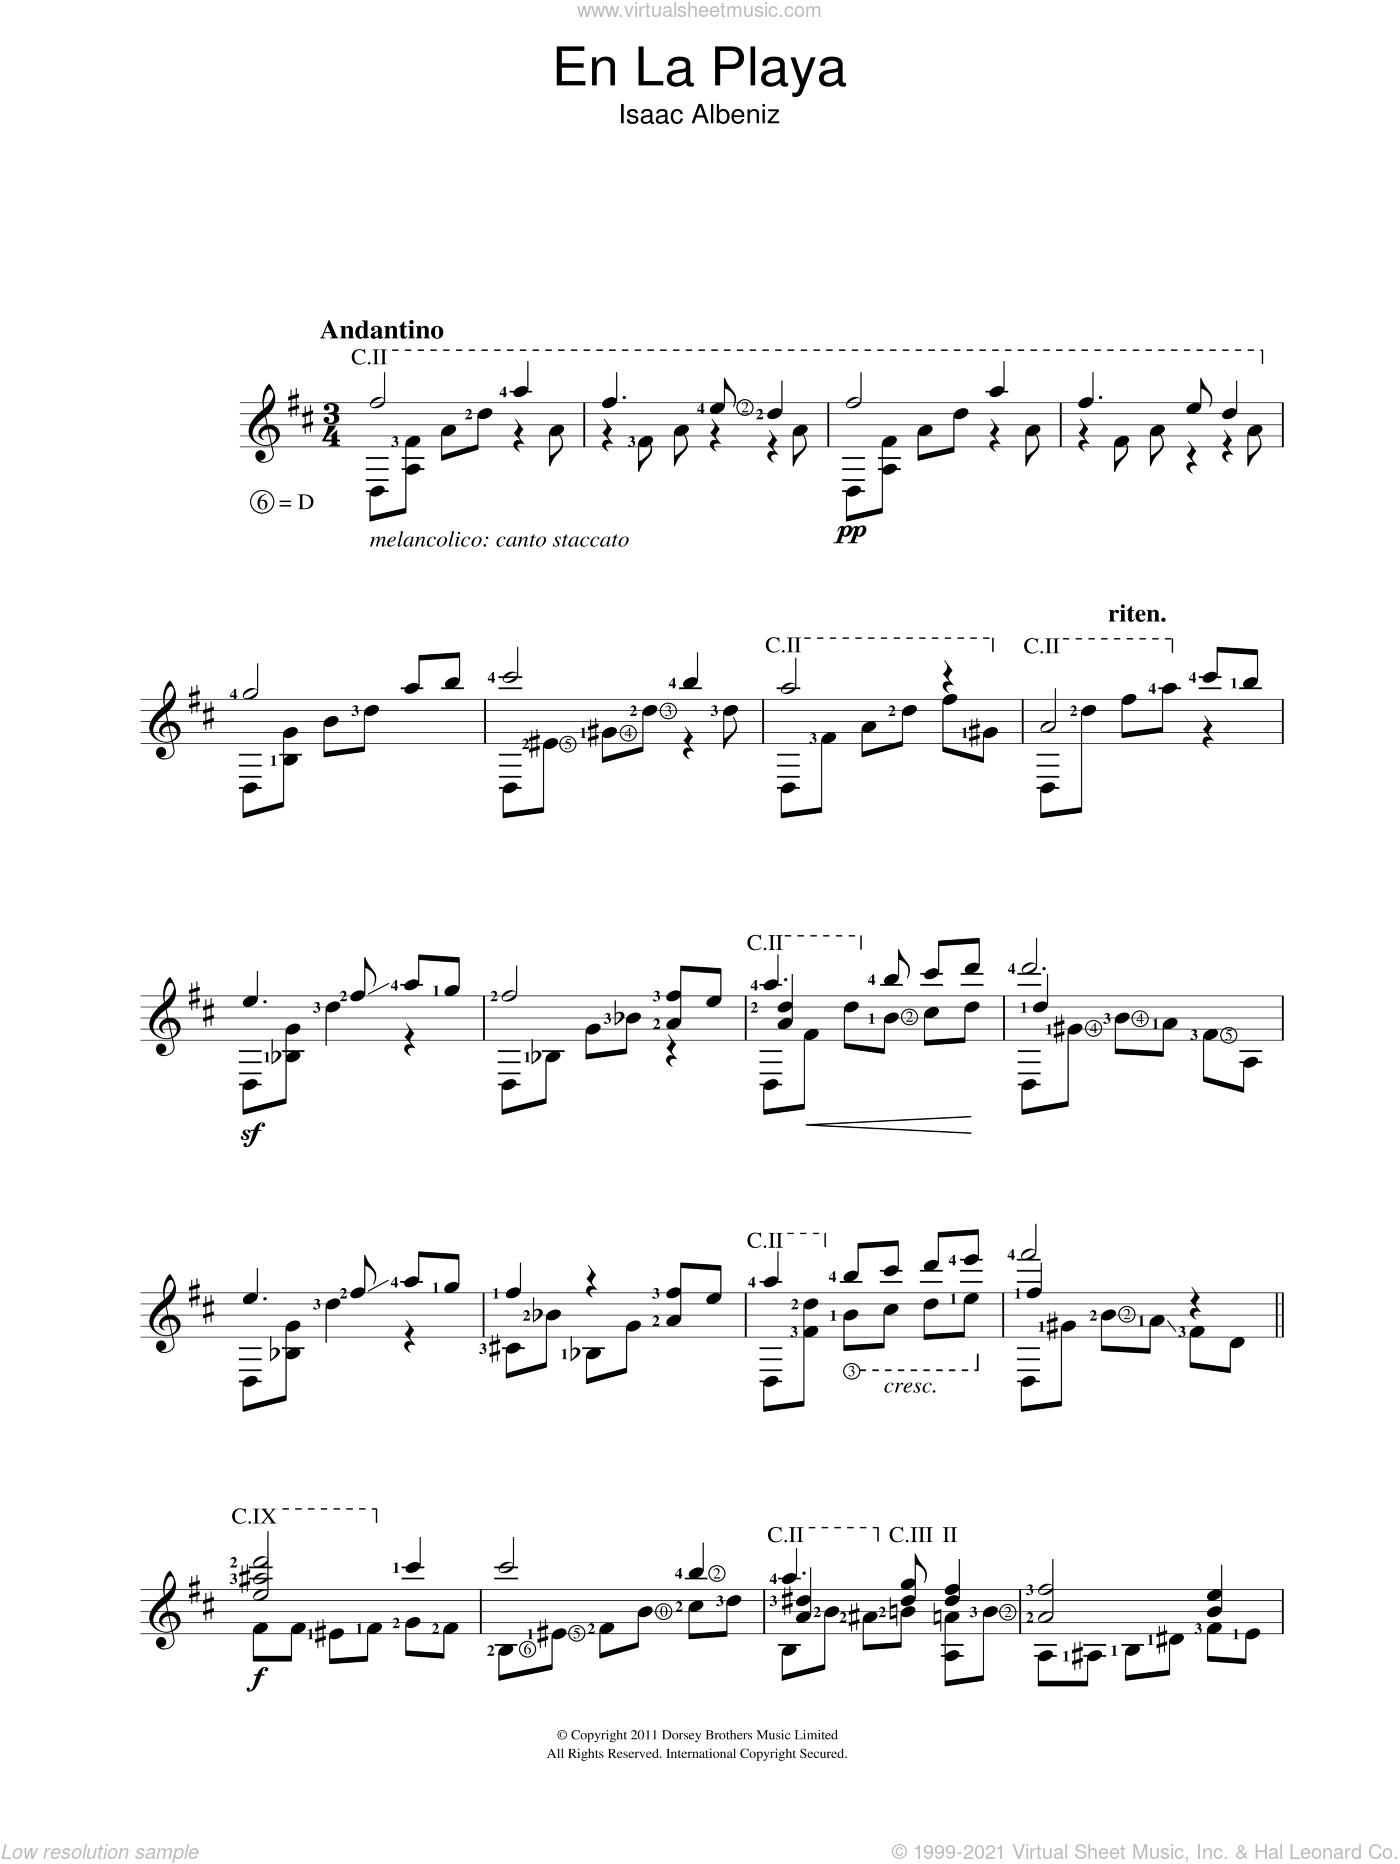 En La Playa sheet music for guitar solo (chords) by Isaac Albeniz, classical score, easy guitar (chords)